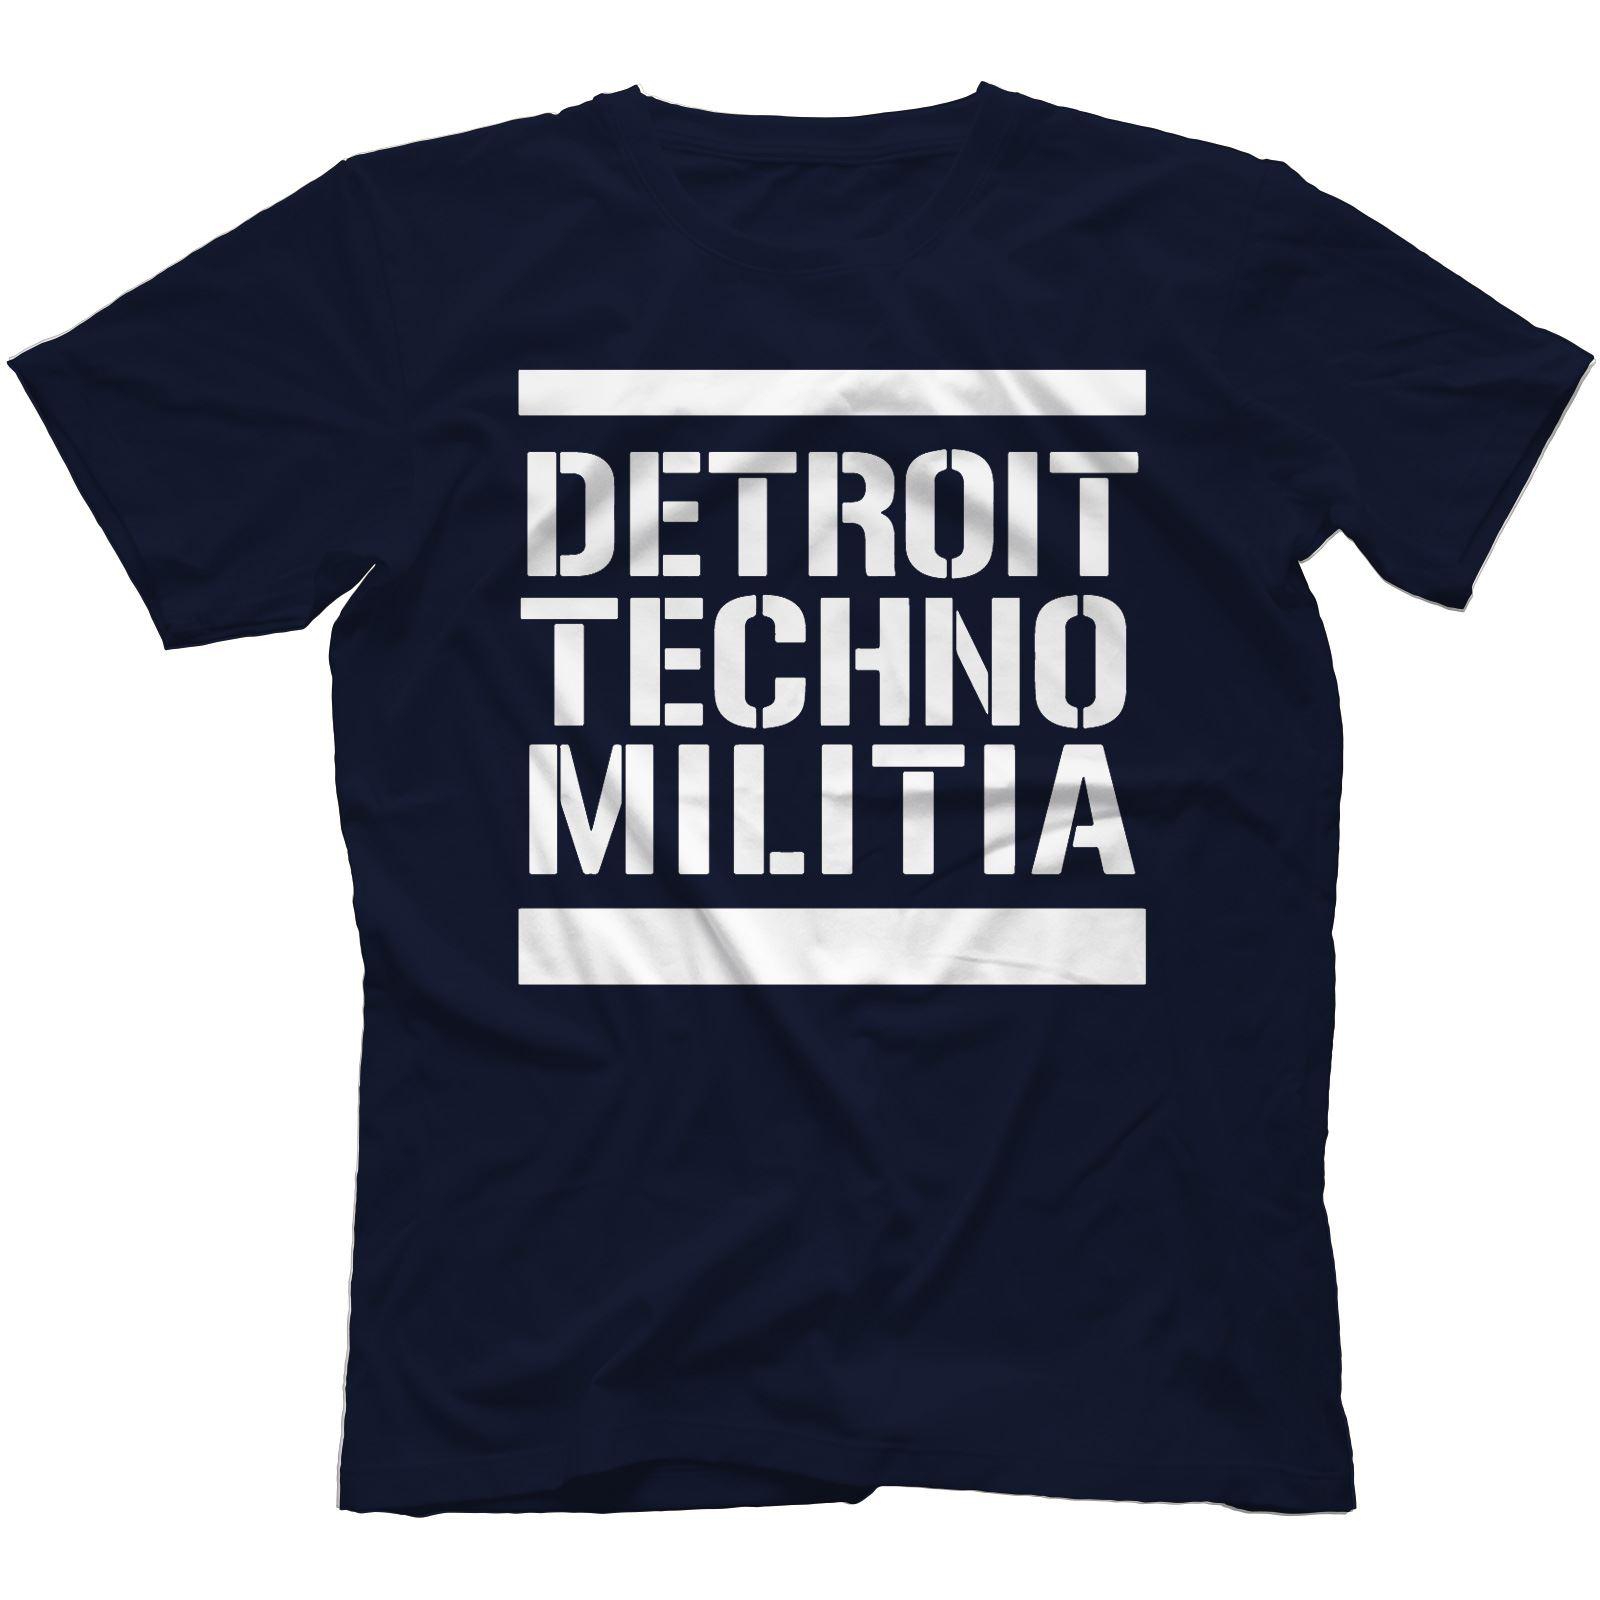 Detroit-Techno-Militia-T-Shirt-100-Cotton-Vinyl-909-Underground-Resistance Indexbild 30